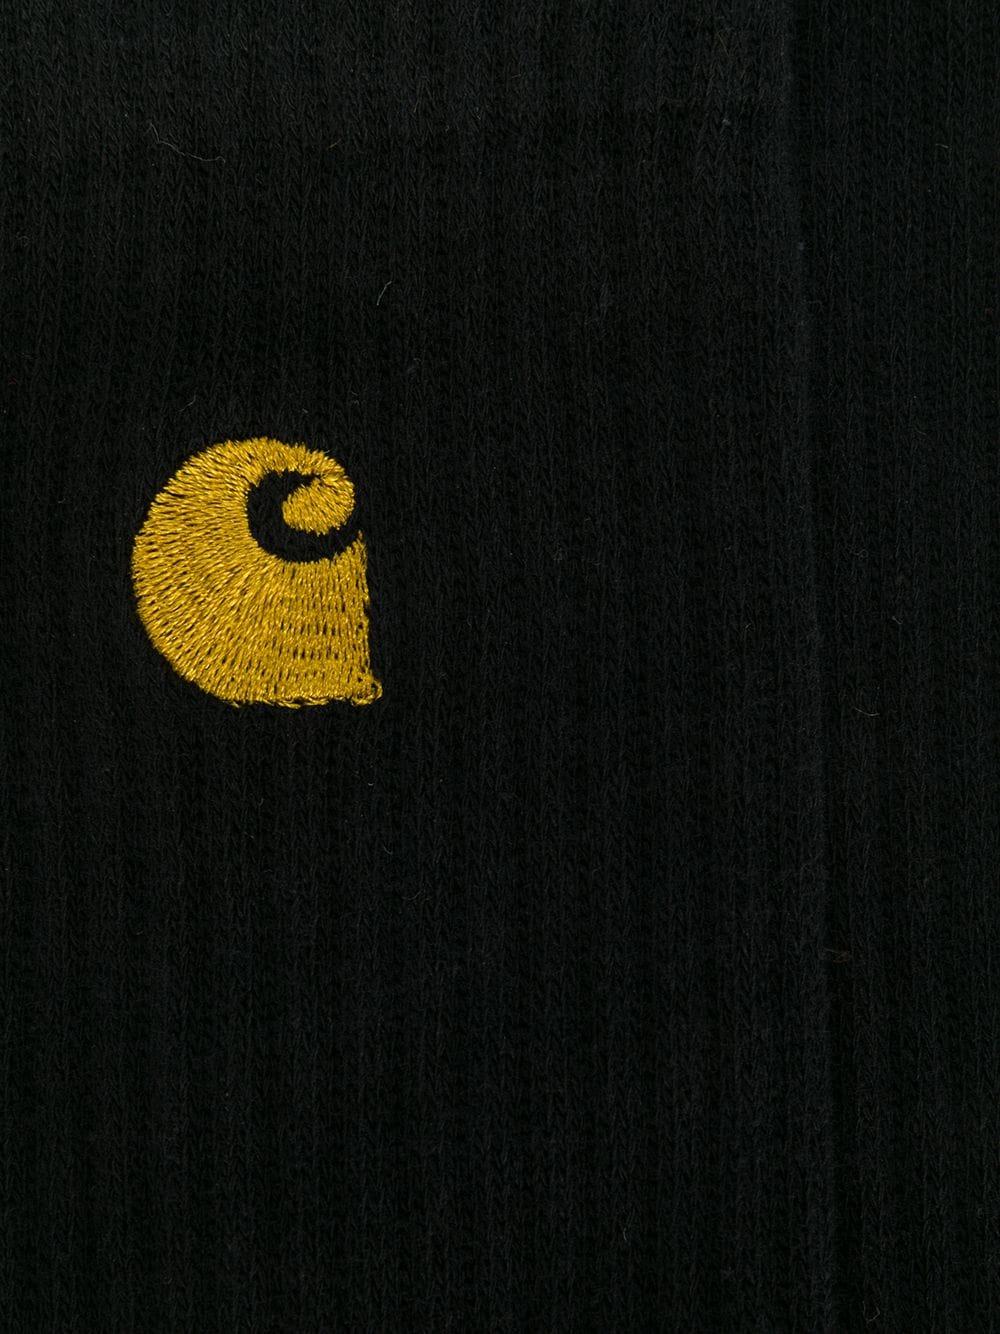 Carhartt Wip calzini con logo uomo nero CARHARTT WIP | Calzini | I02652789.90